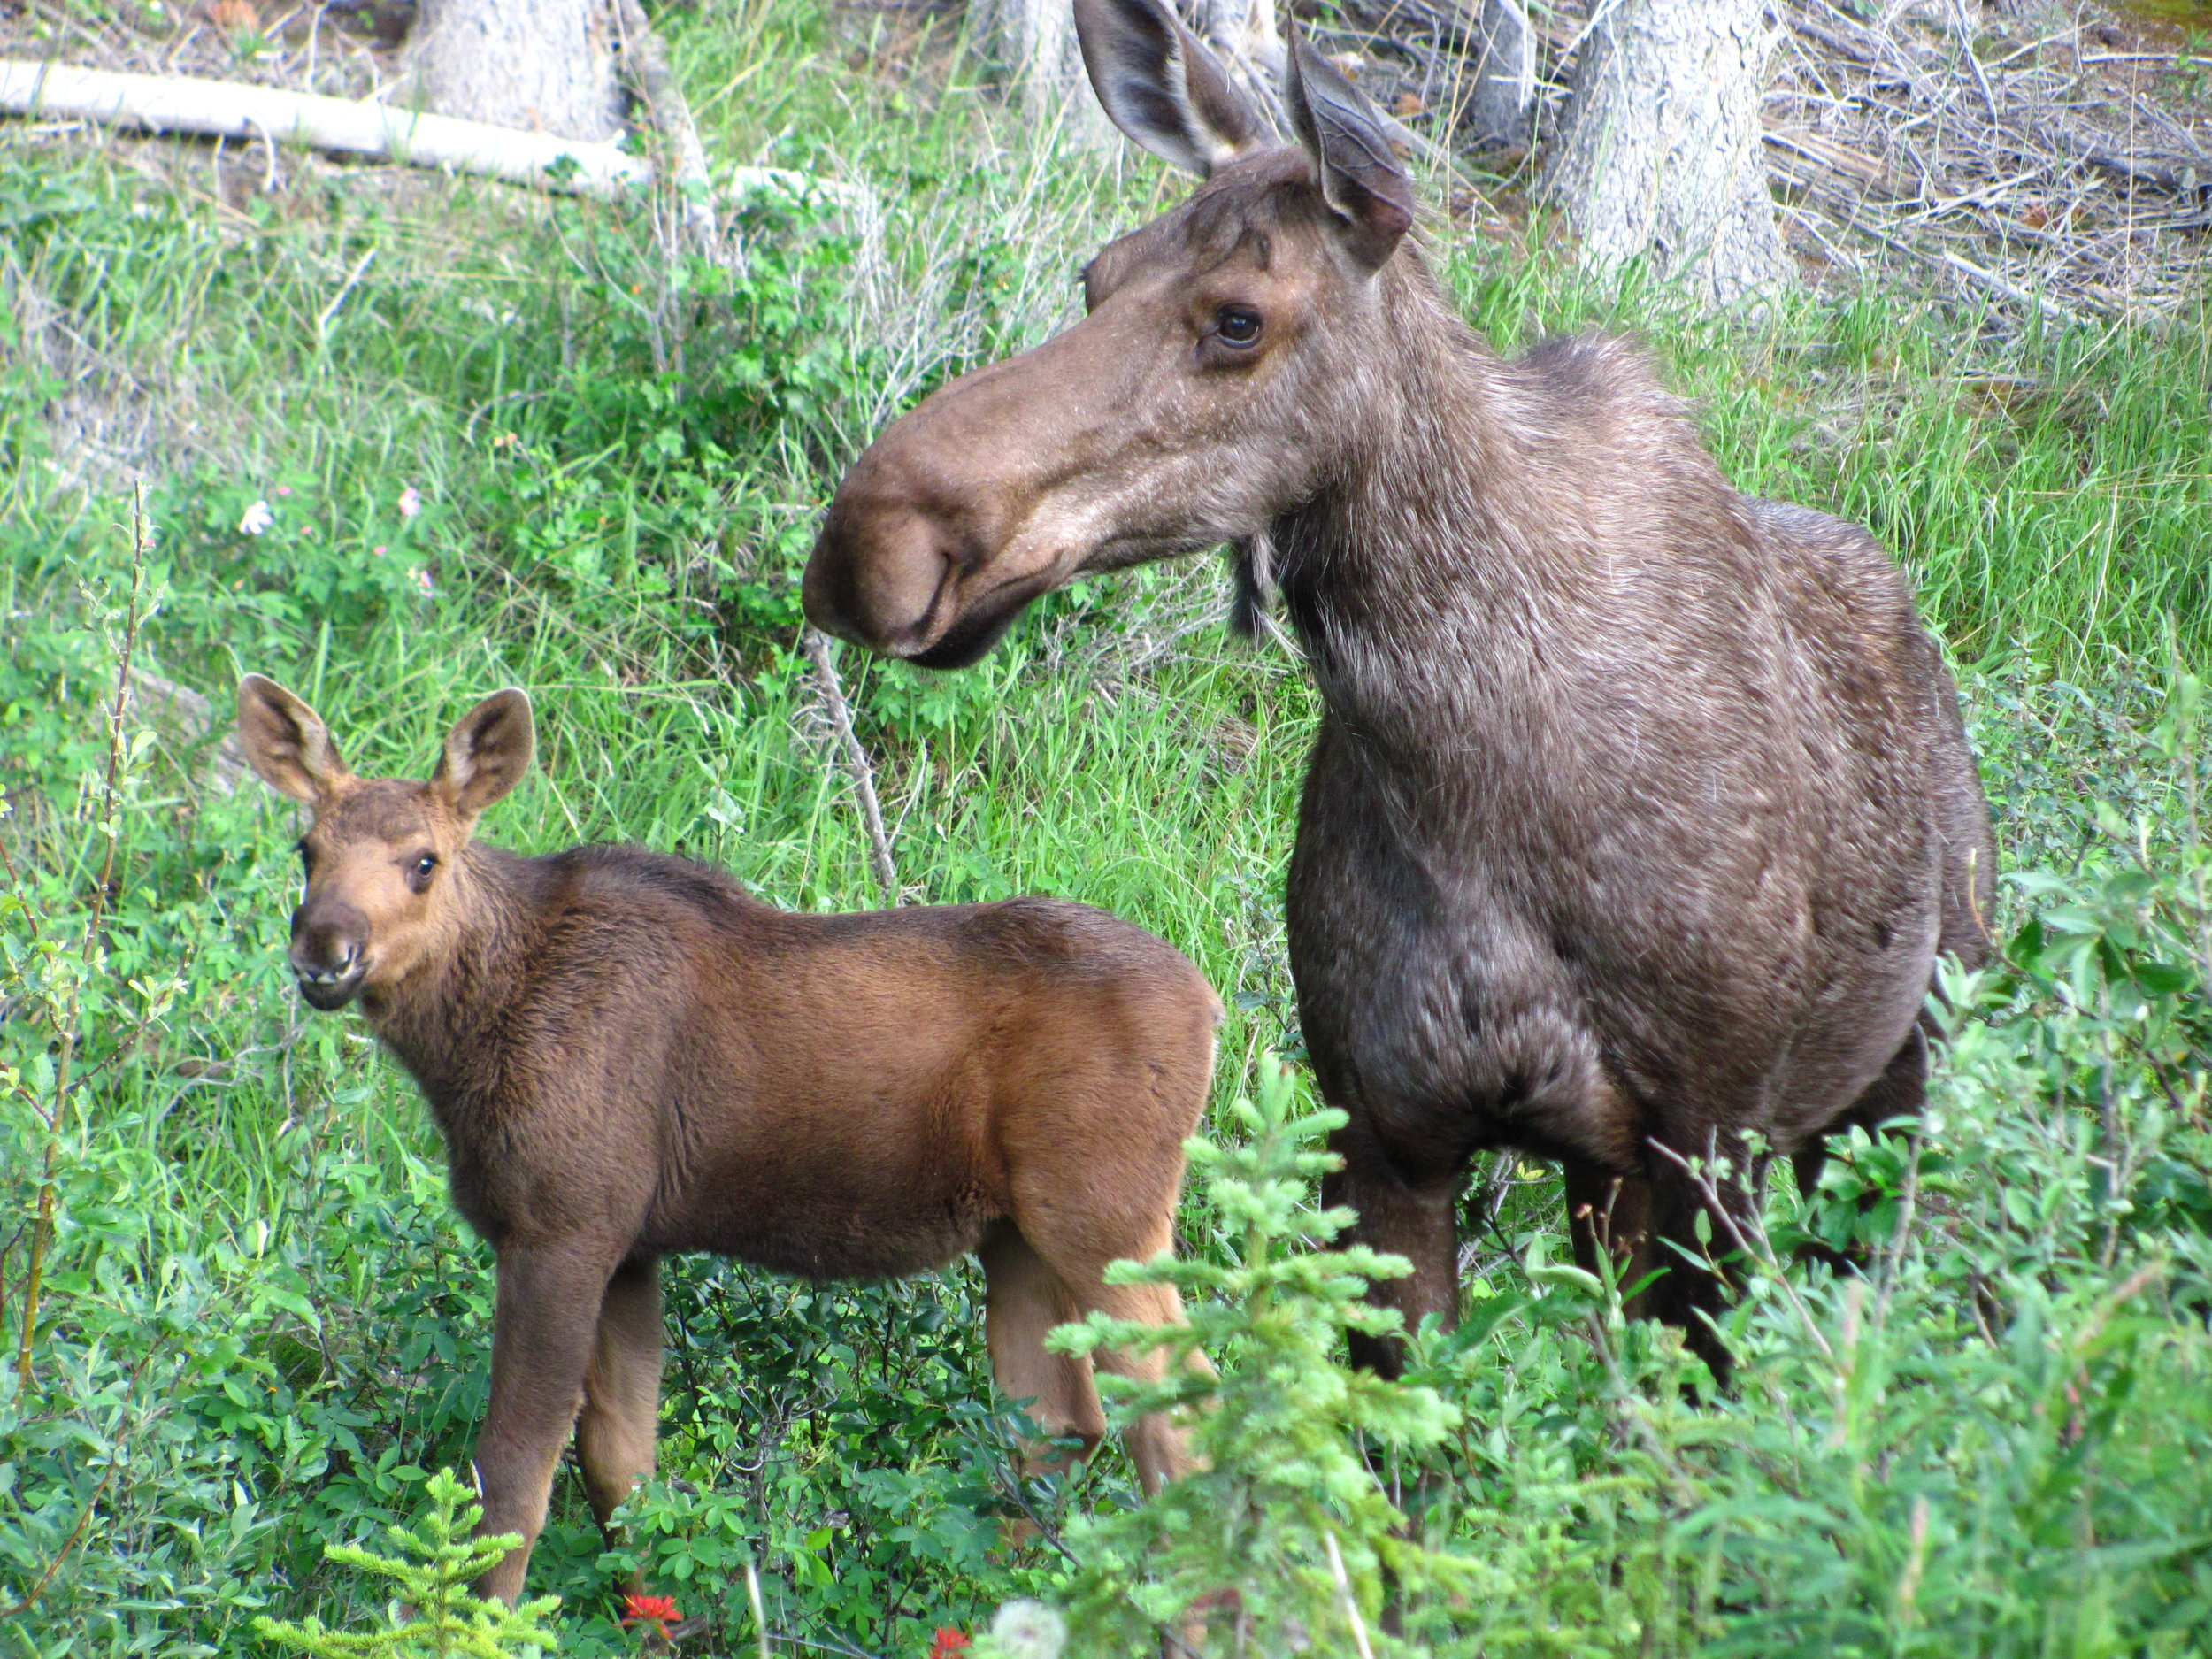 Moose_mother_with_calf - Veronika Ronkos.jpg